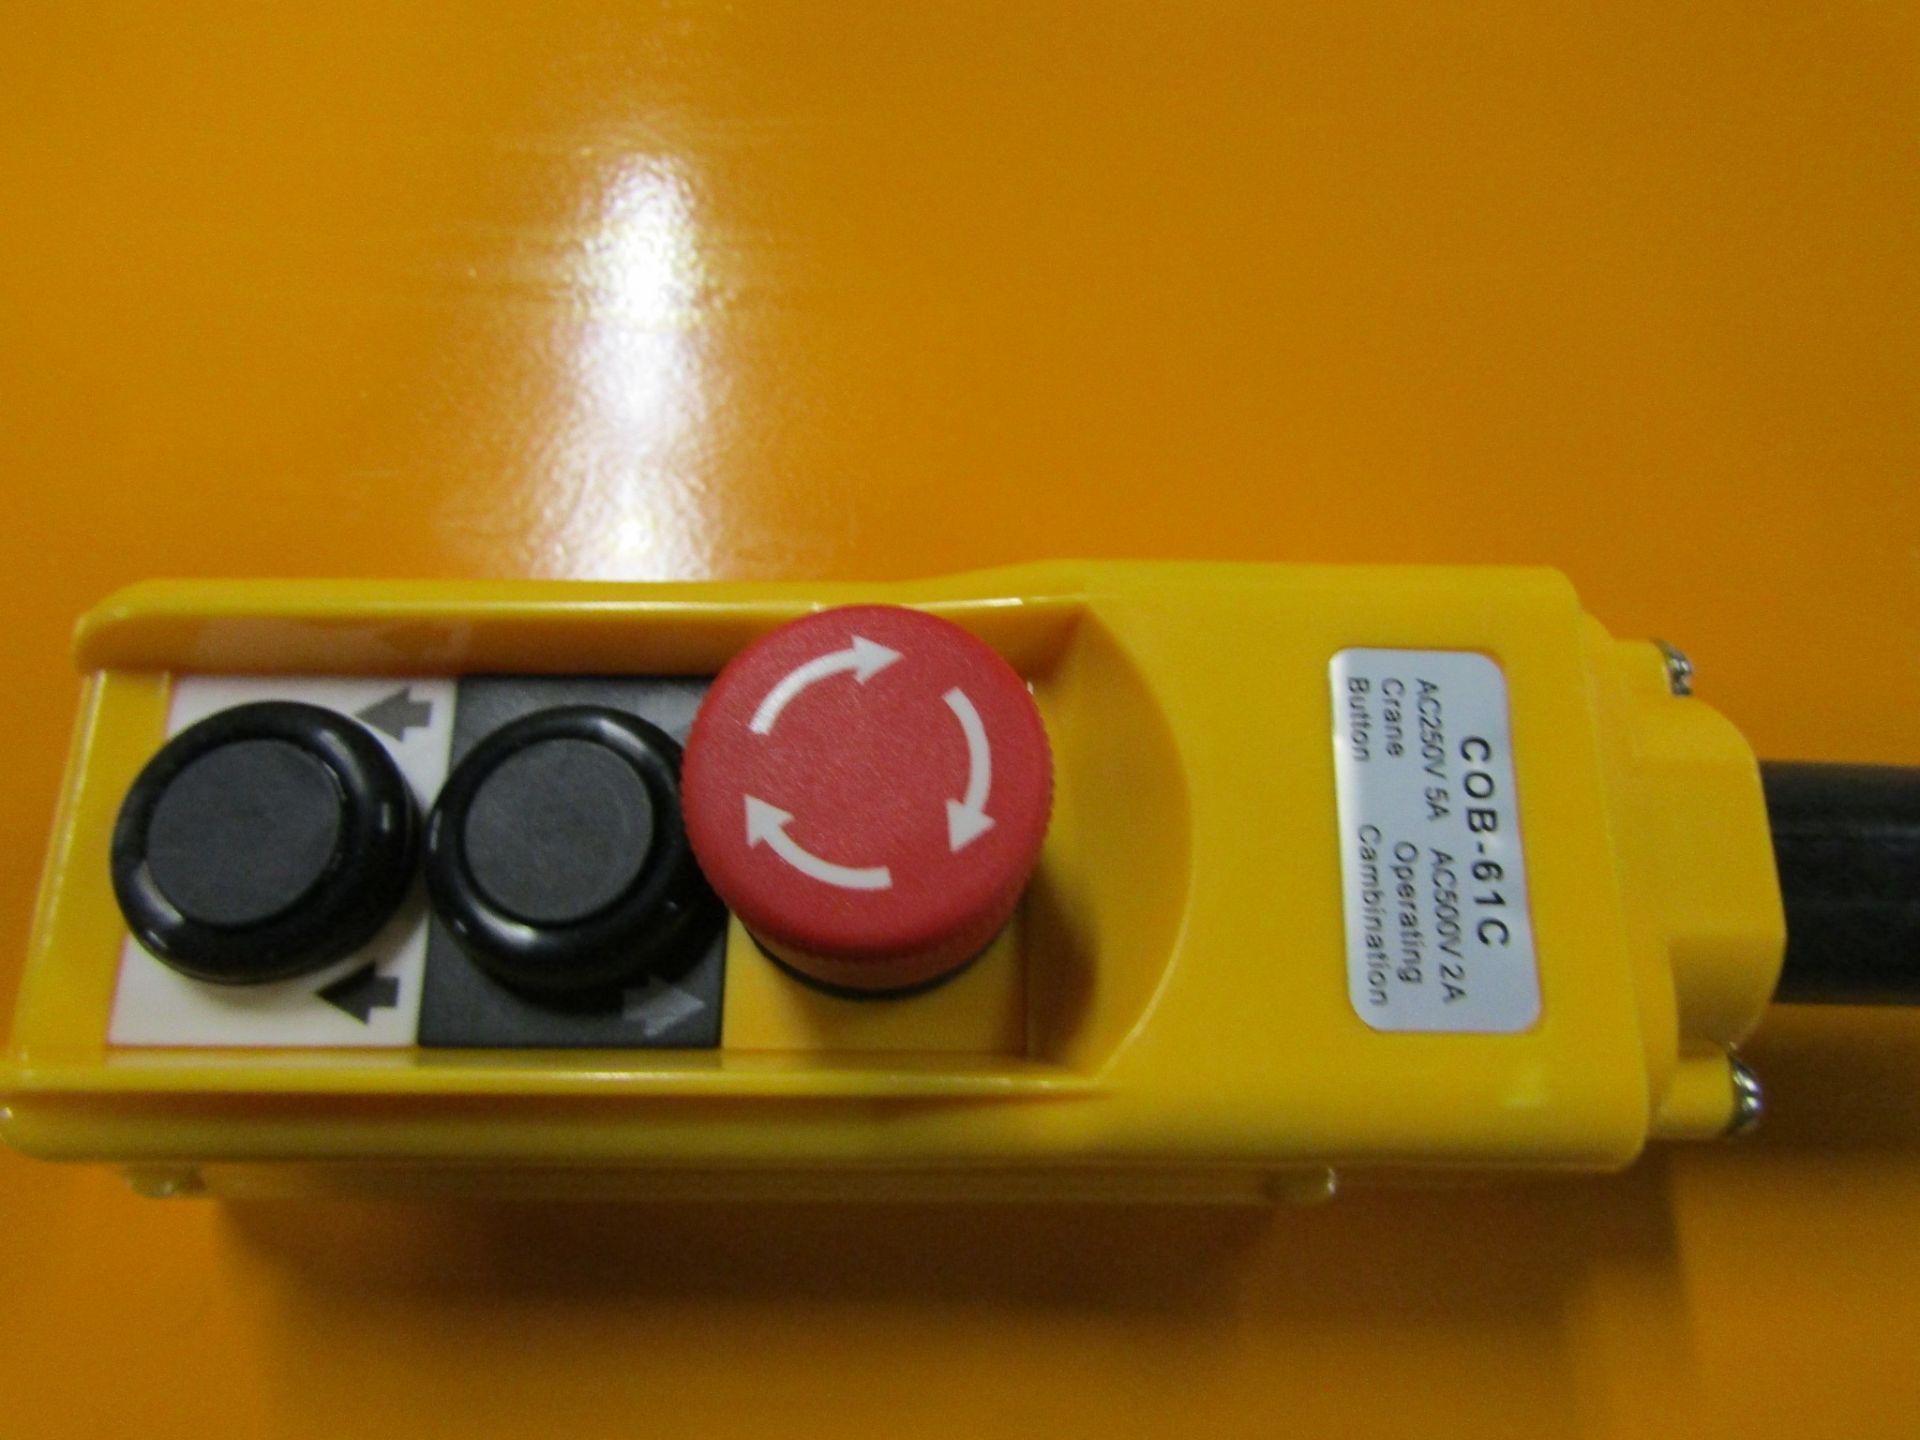 "HW Hydraulic Lift Table 32"" x 52"" x 40"" lift - 2000lbs capacity - MINT - 115V - Image 2 of 2"